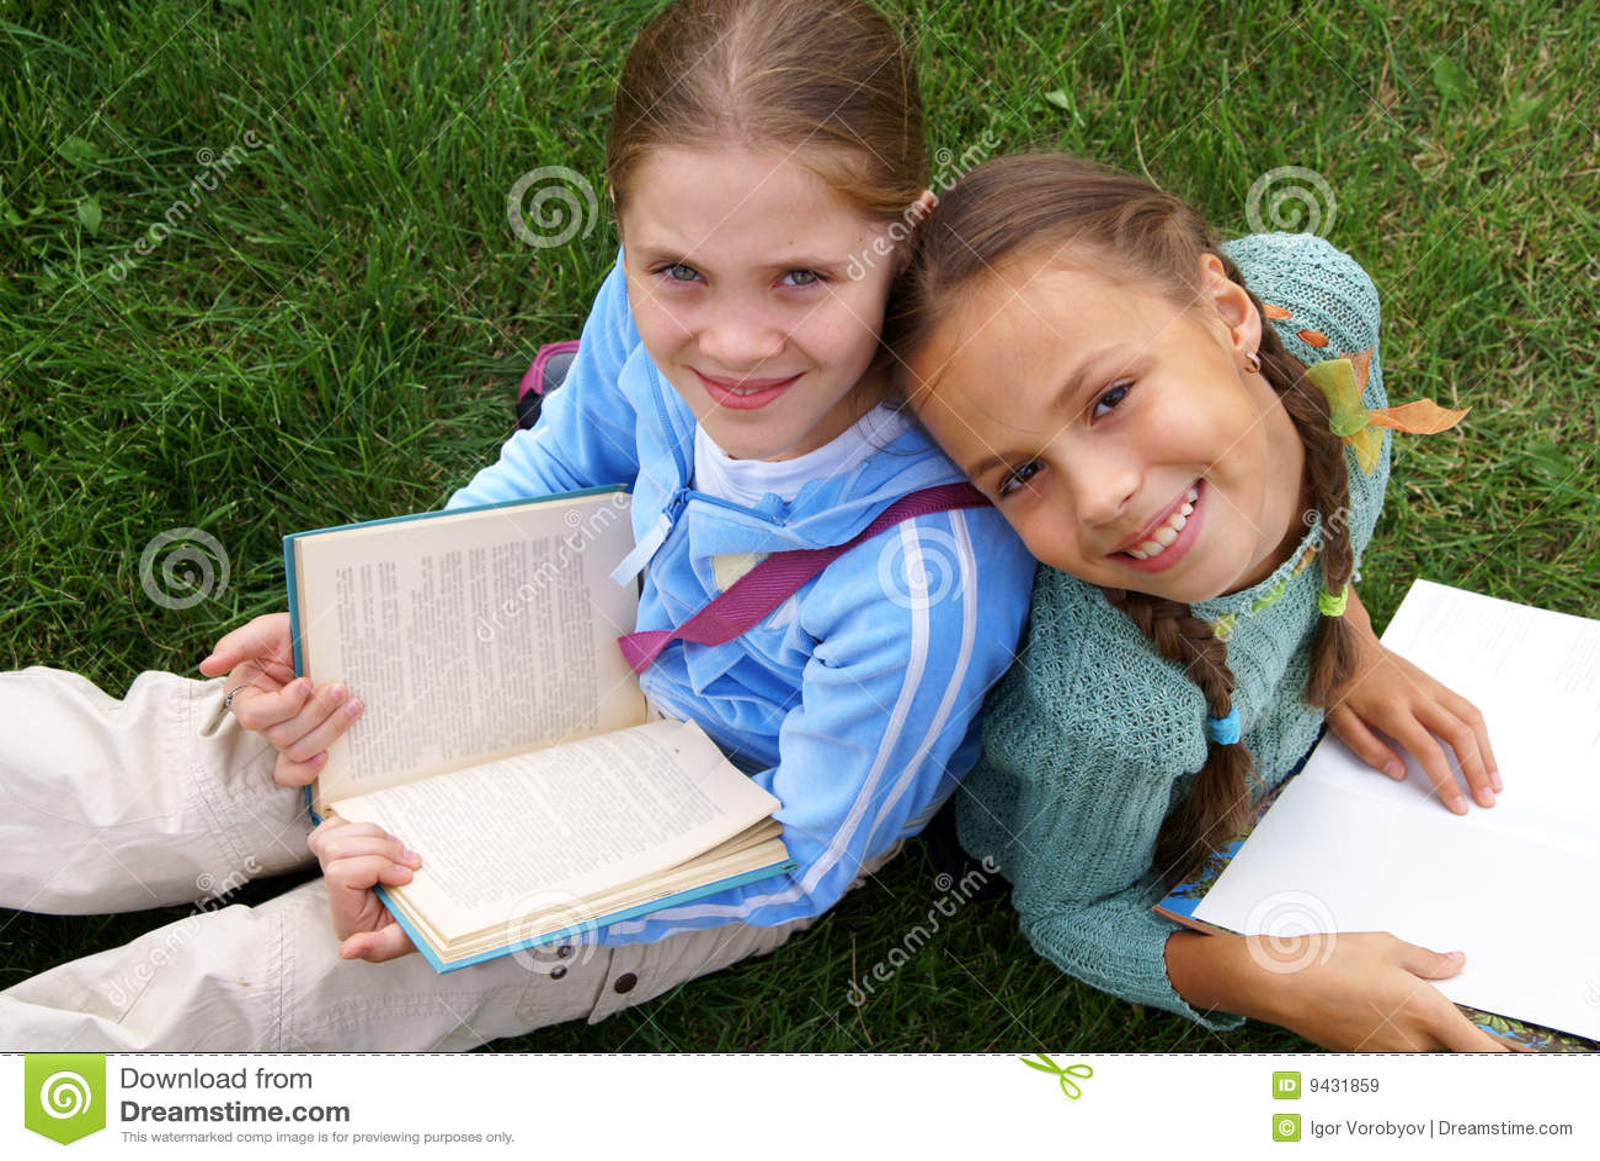 Preteen school girls reading books on green grass background outdoors.